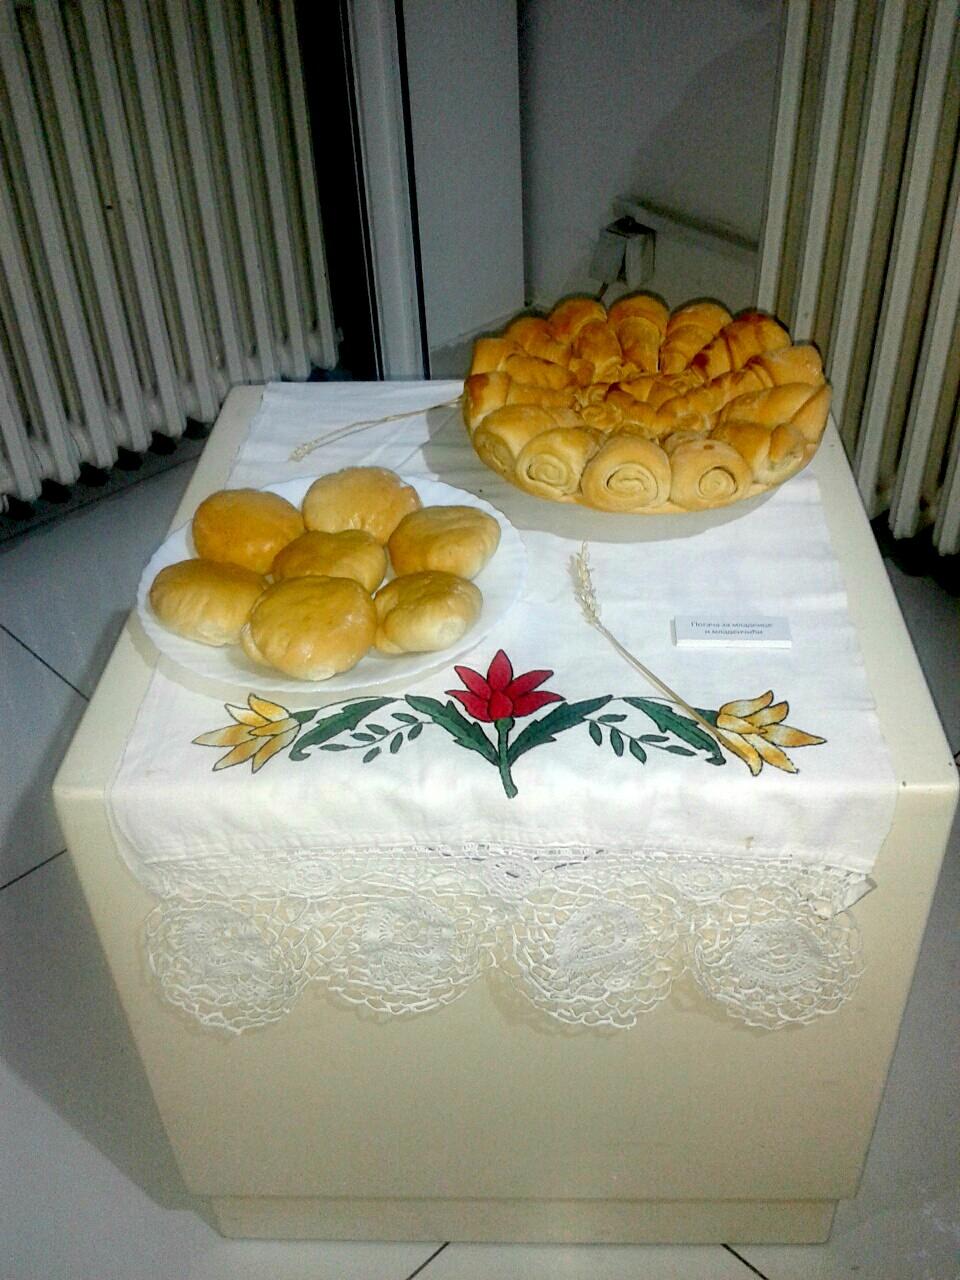 Simbol života - hleb